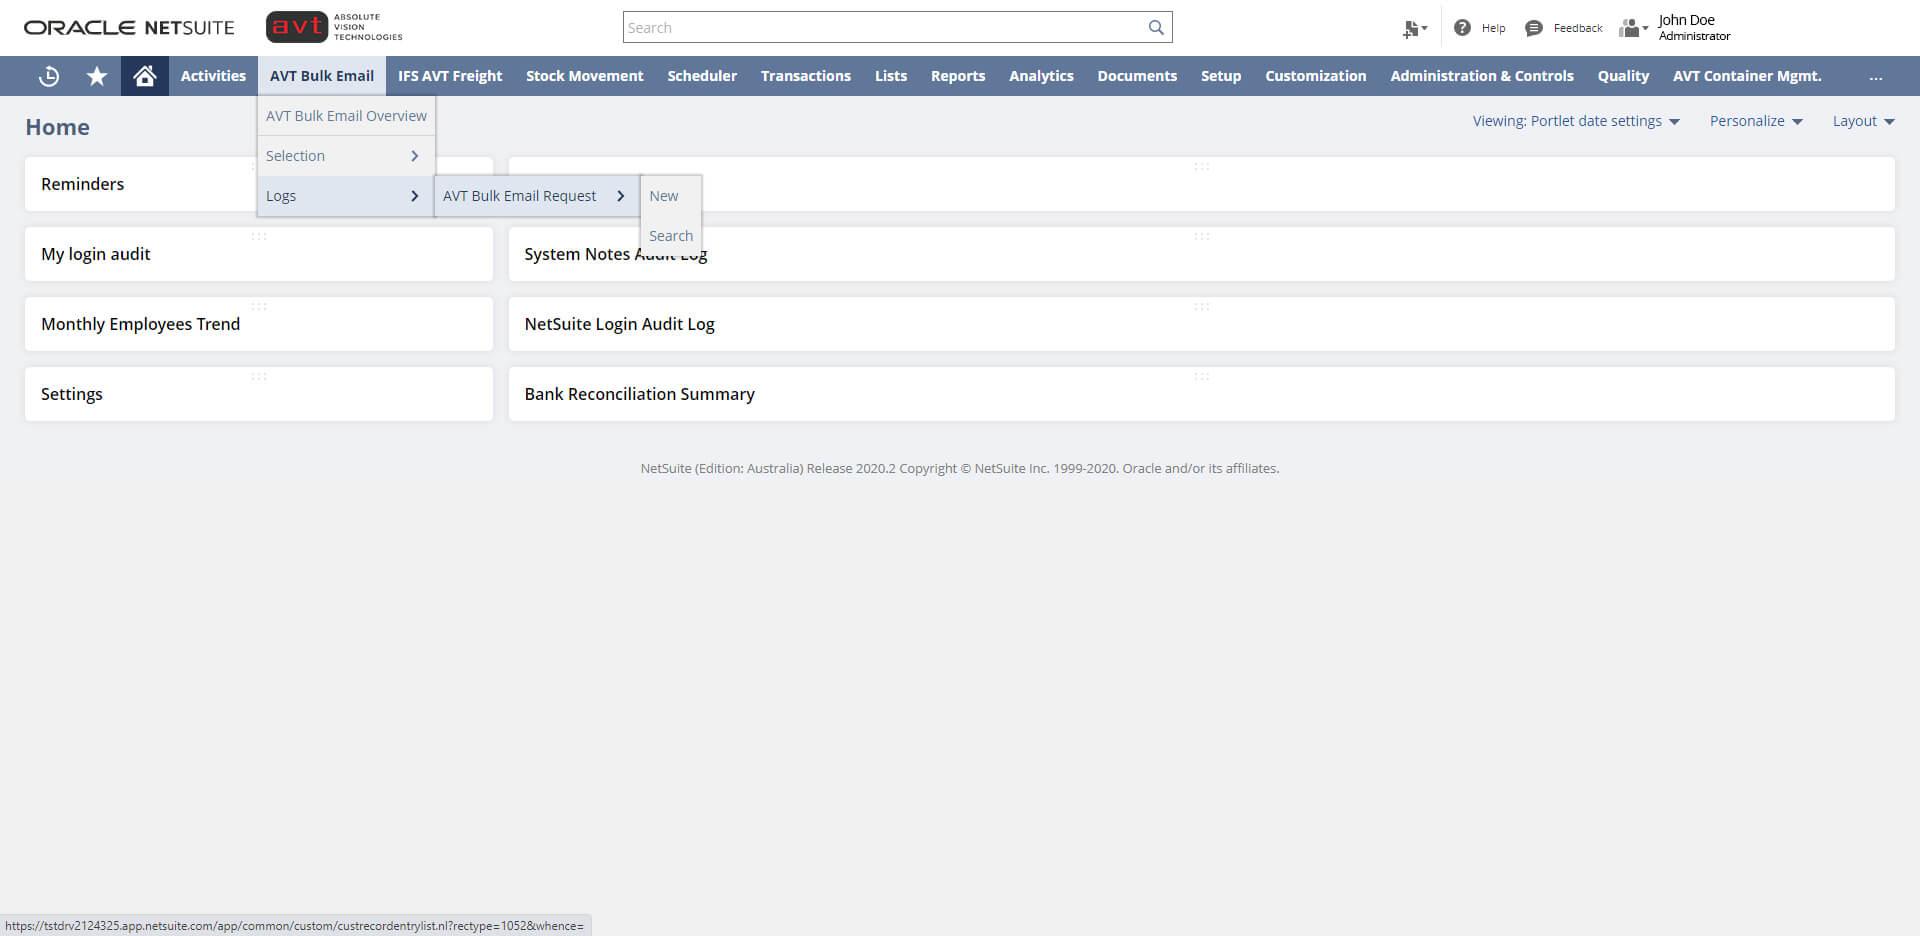 AVT Bulk Invoicing App - Log Record Navigation